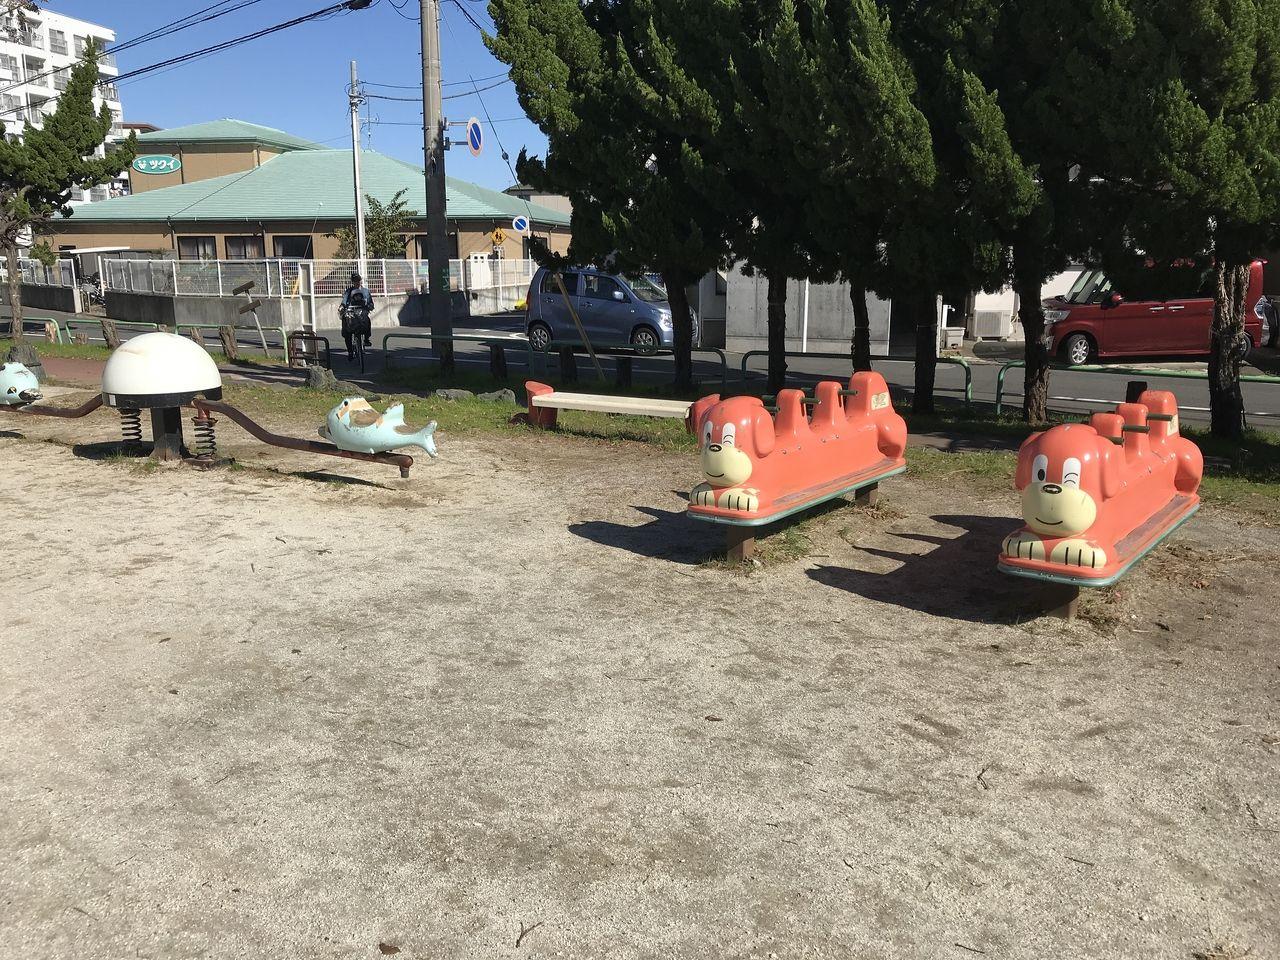 行徳の福栄公園の幼児用遊具